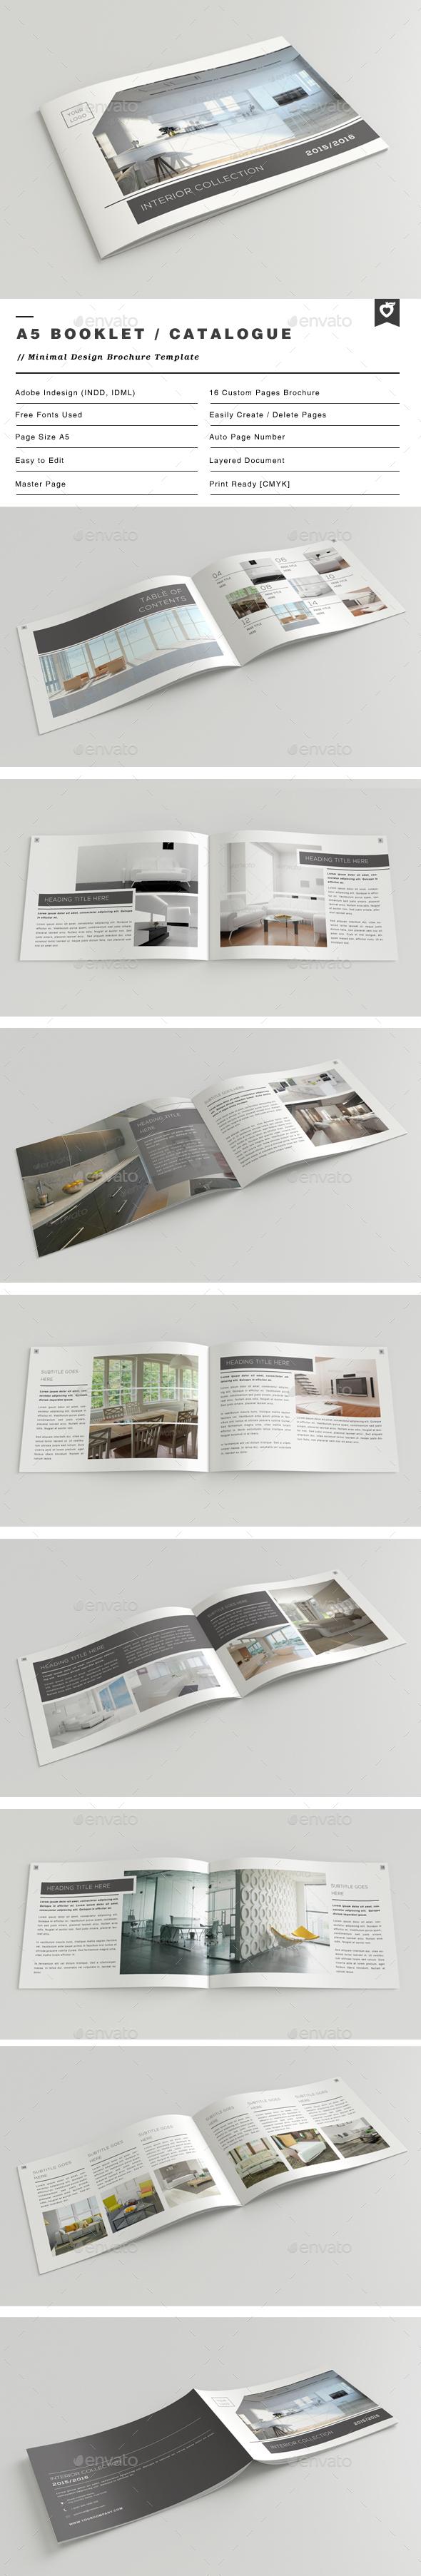 A5 Booklet / Catalogue - Catalogs Brochures